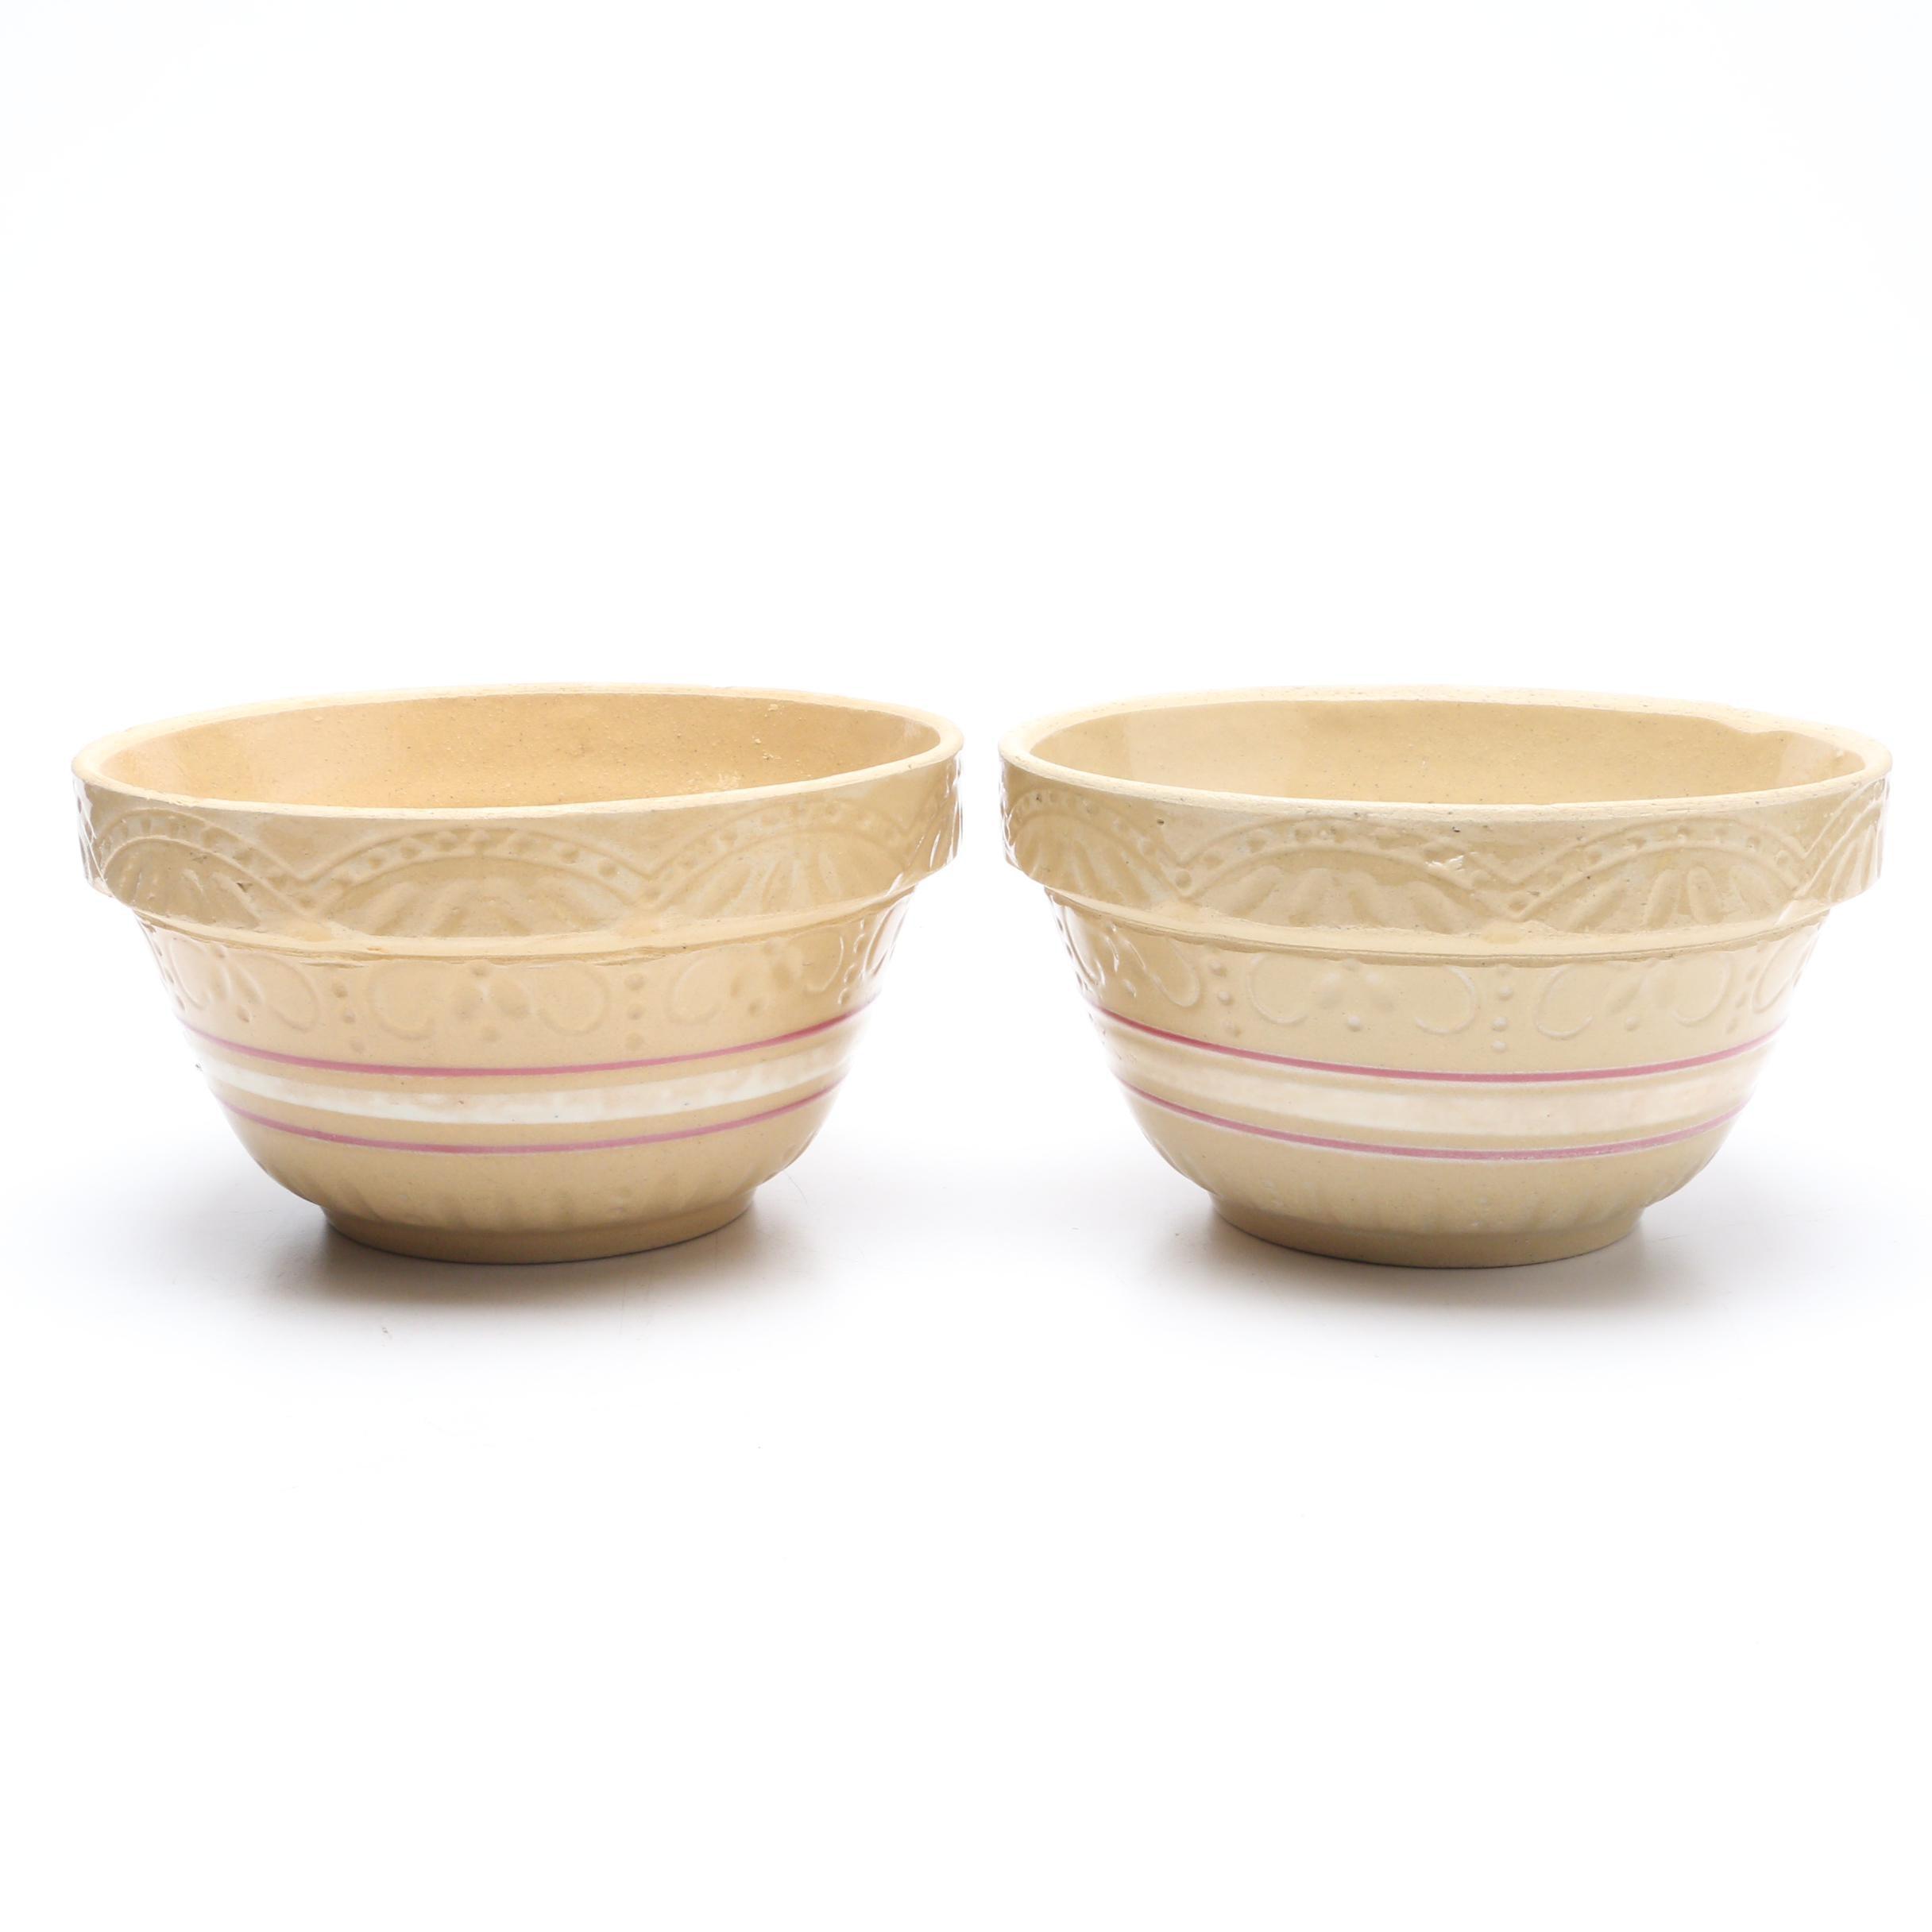 Robinson Ransbottom Yellow Ware Bowls